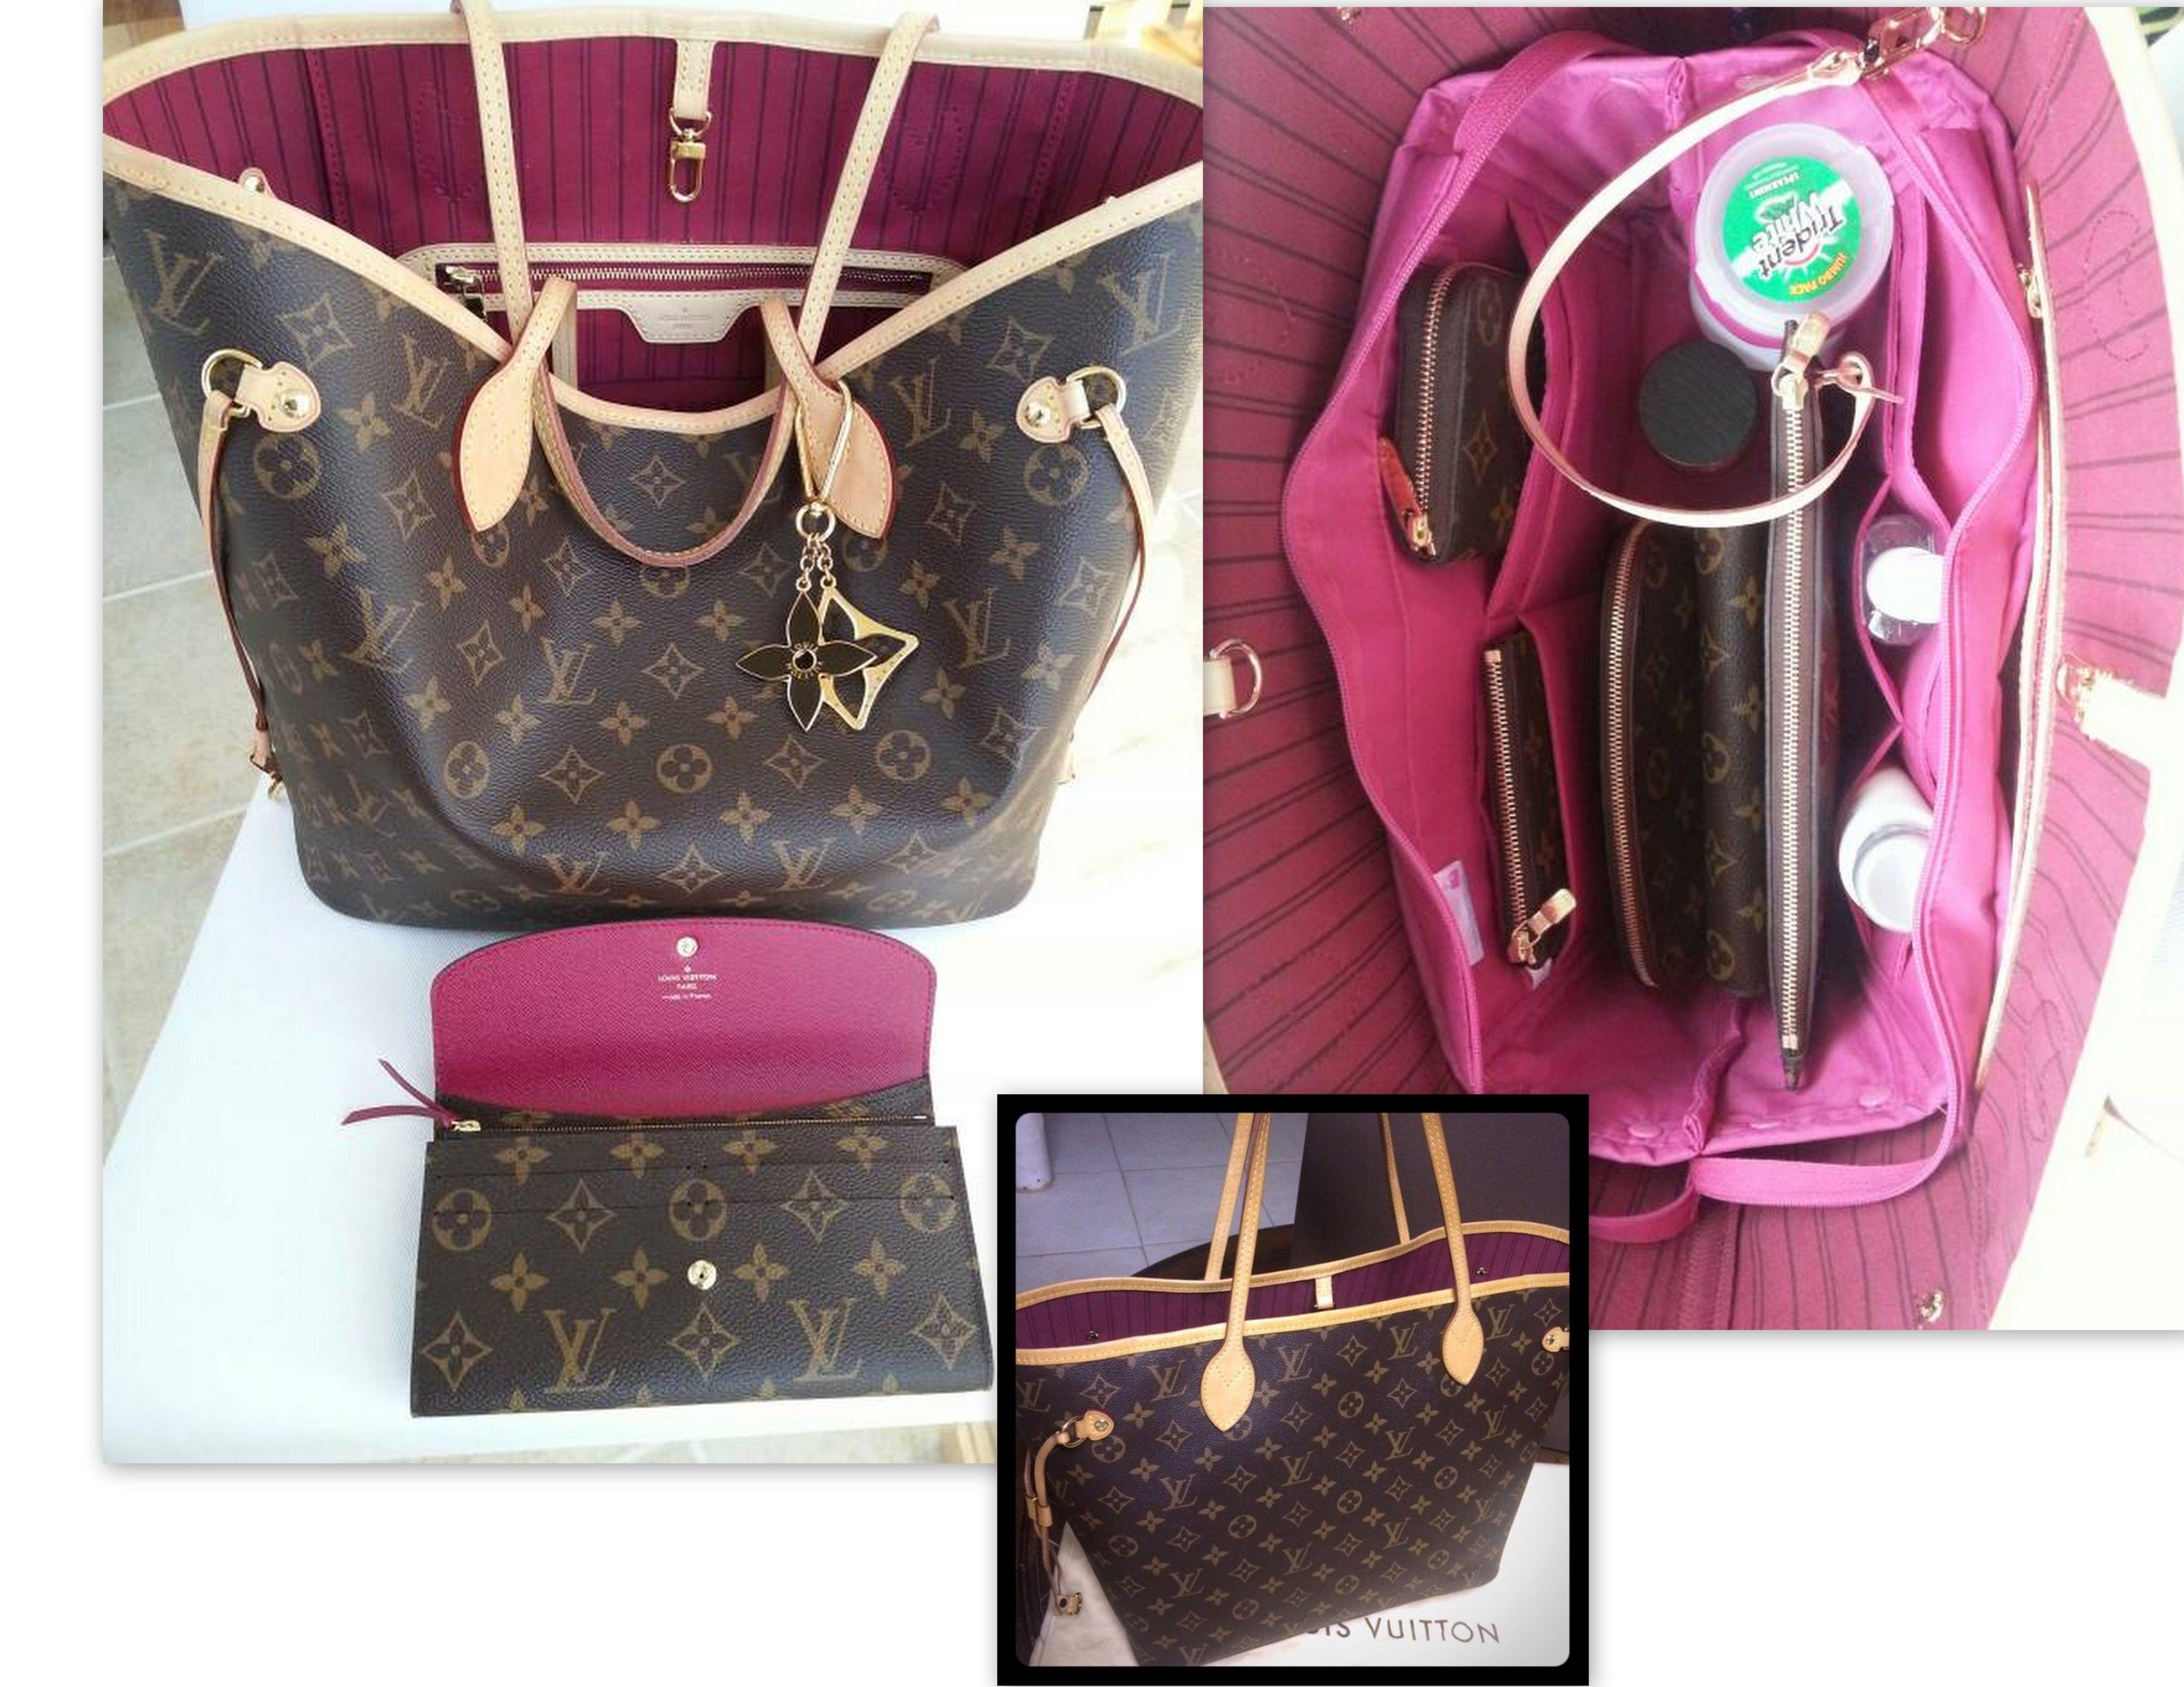 993436d2be86 Louis Vuitton Neverfull MM Fuchsia Interior Shoulder Monogram Bag 2014